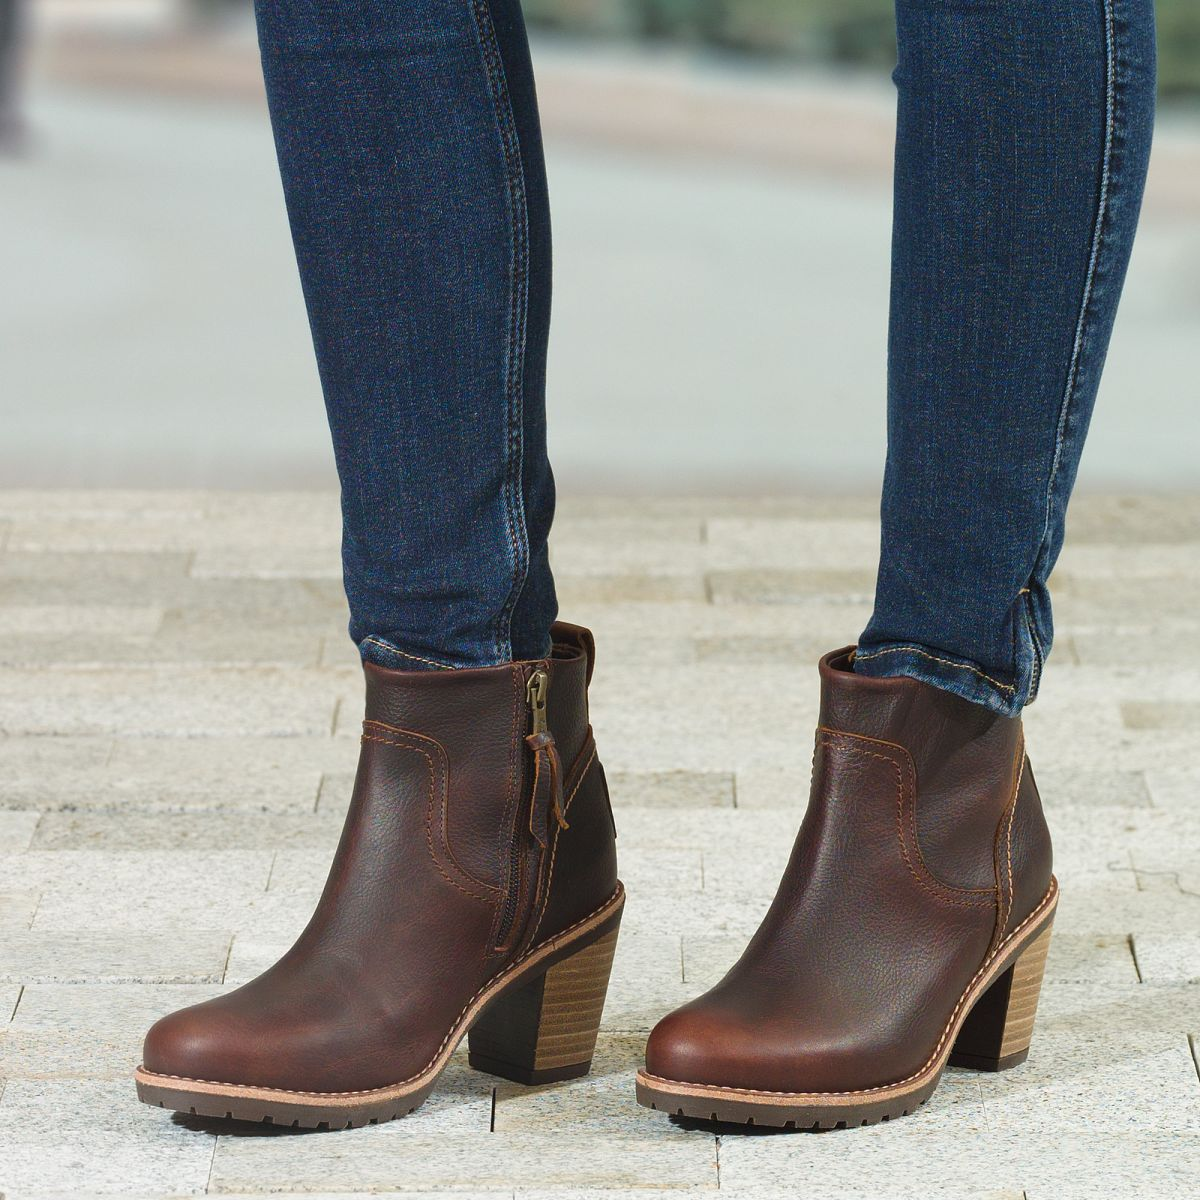 Womens ankle boots arles chestnut panama jack 174 online shop